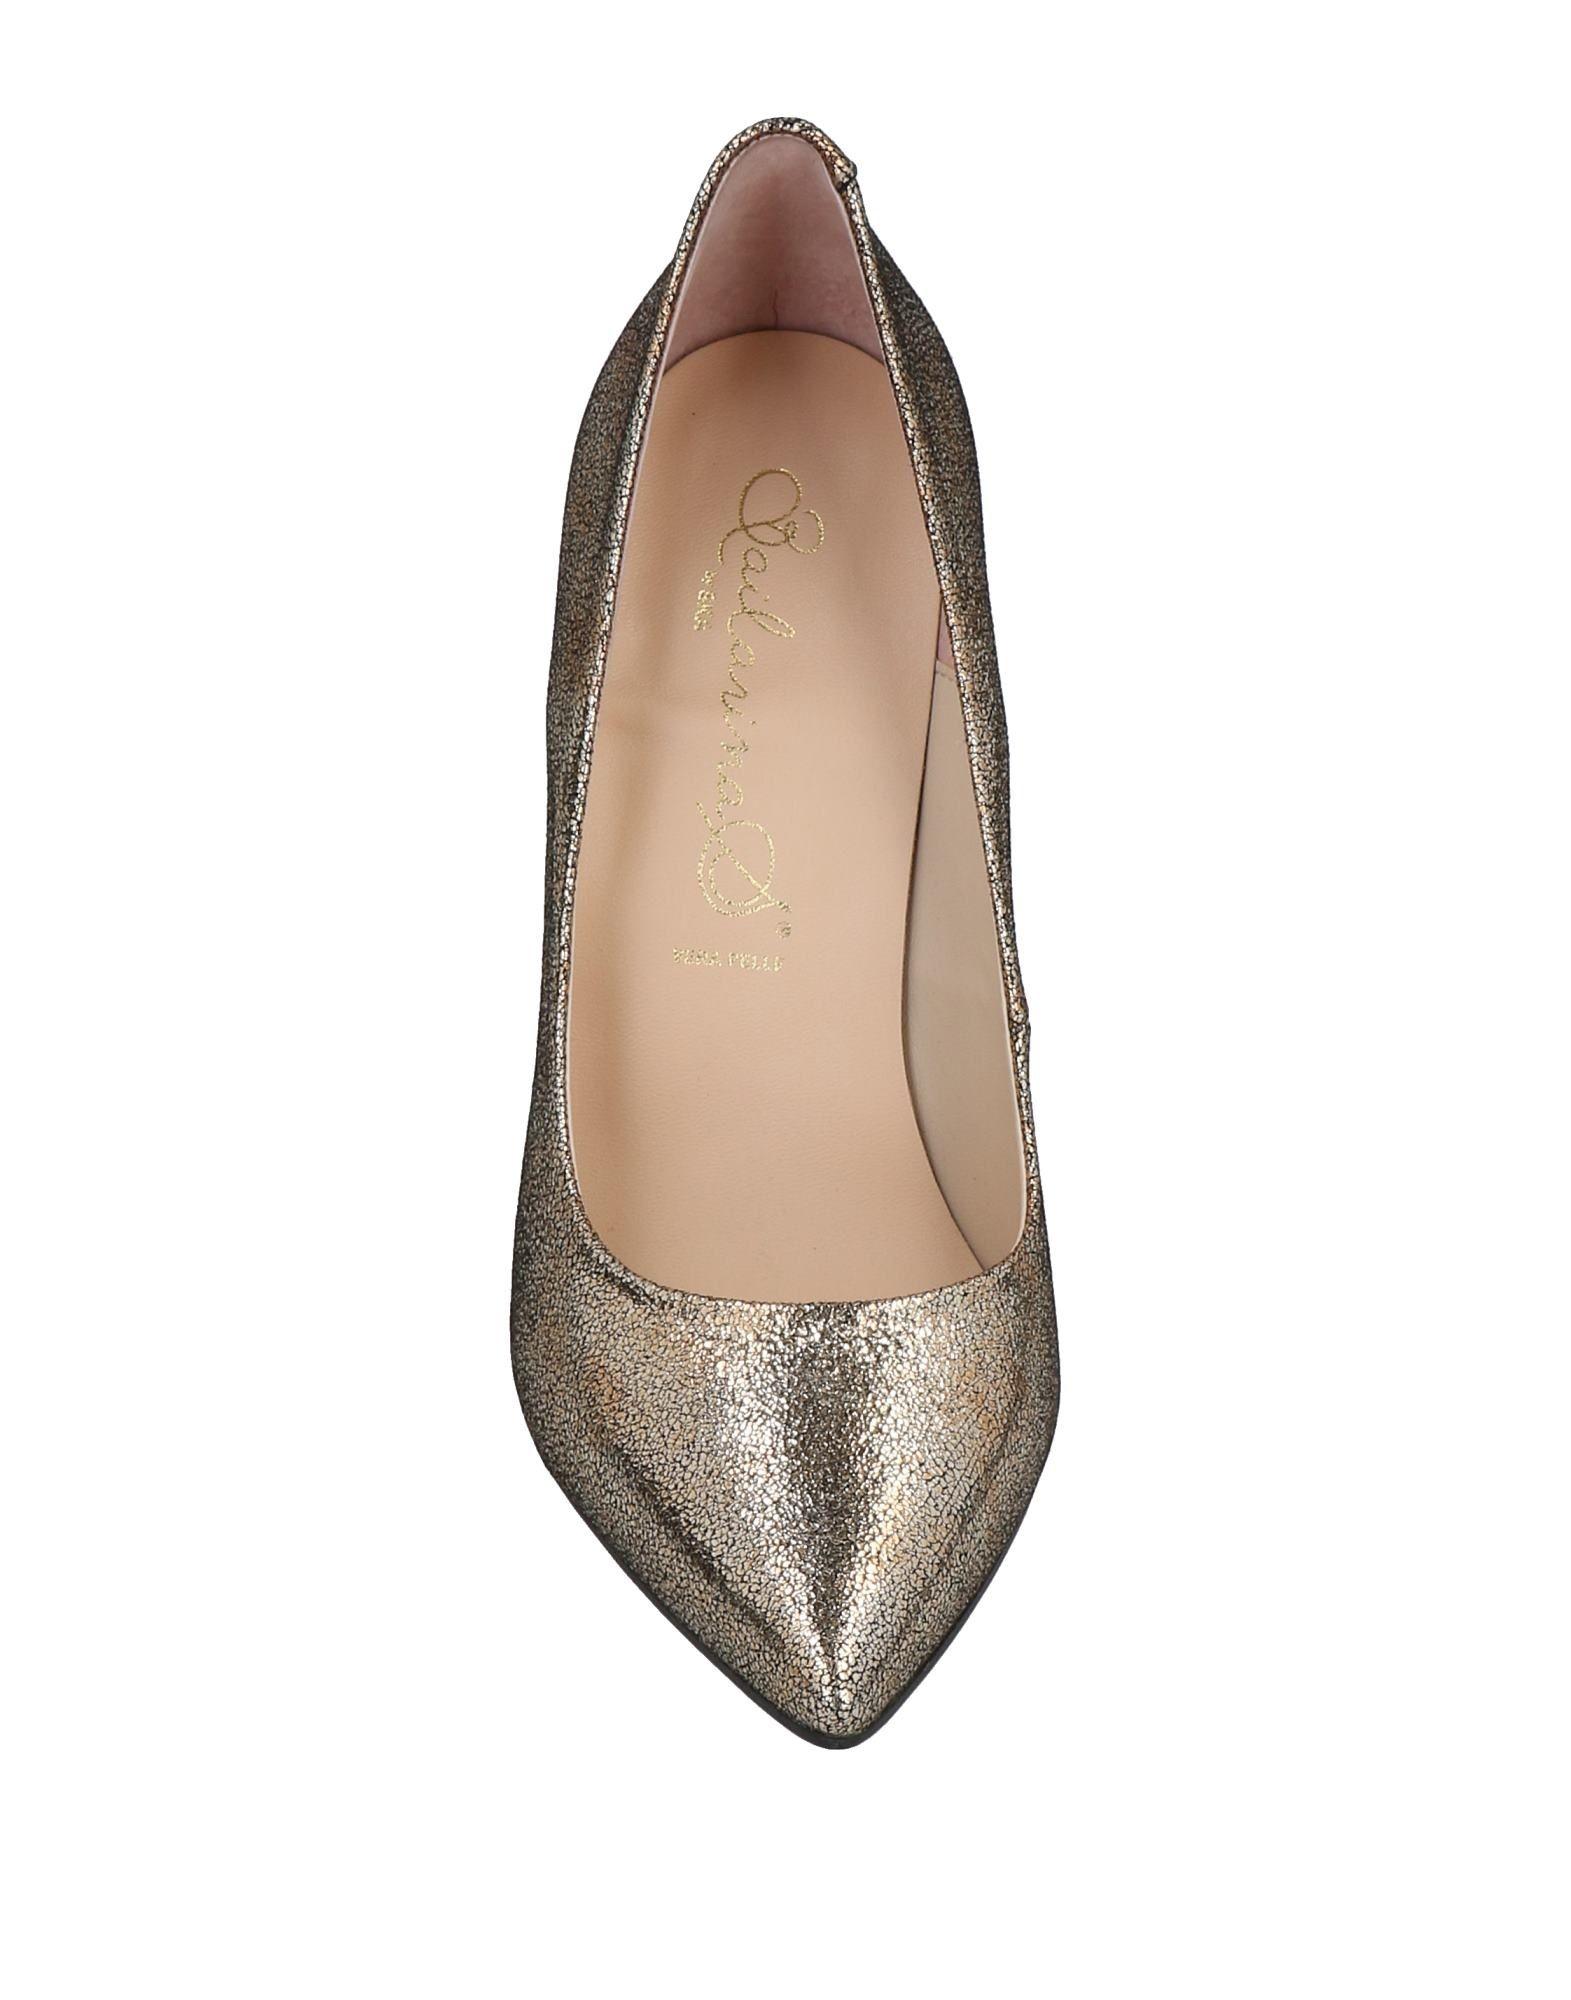 Bailarina By Ska Qualität Pumps Damen  11497429JK Gute Qualität Ska beliebte Schuhe 816960